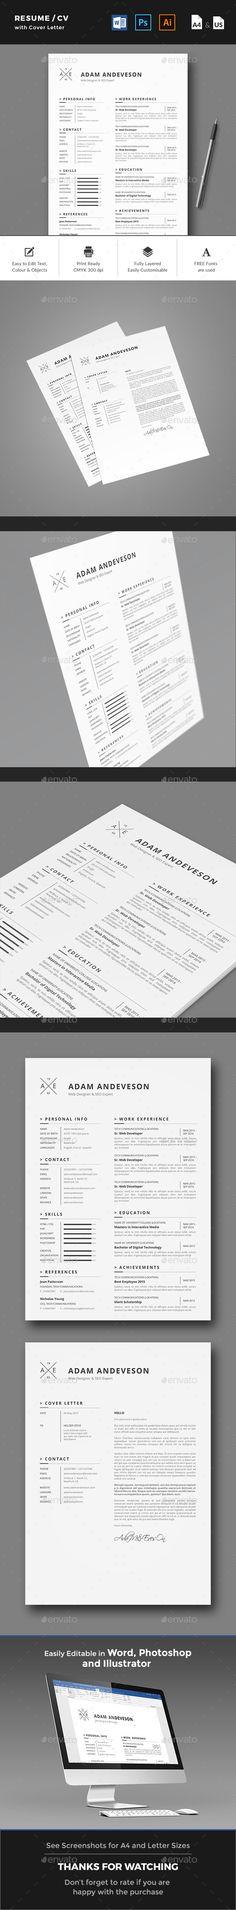 The CV   Resume Creative resume templates - resume cv definition